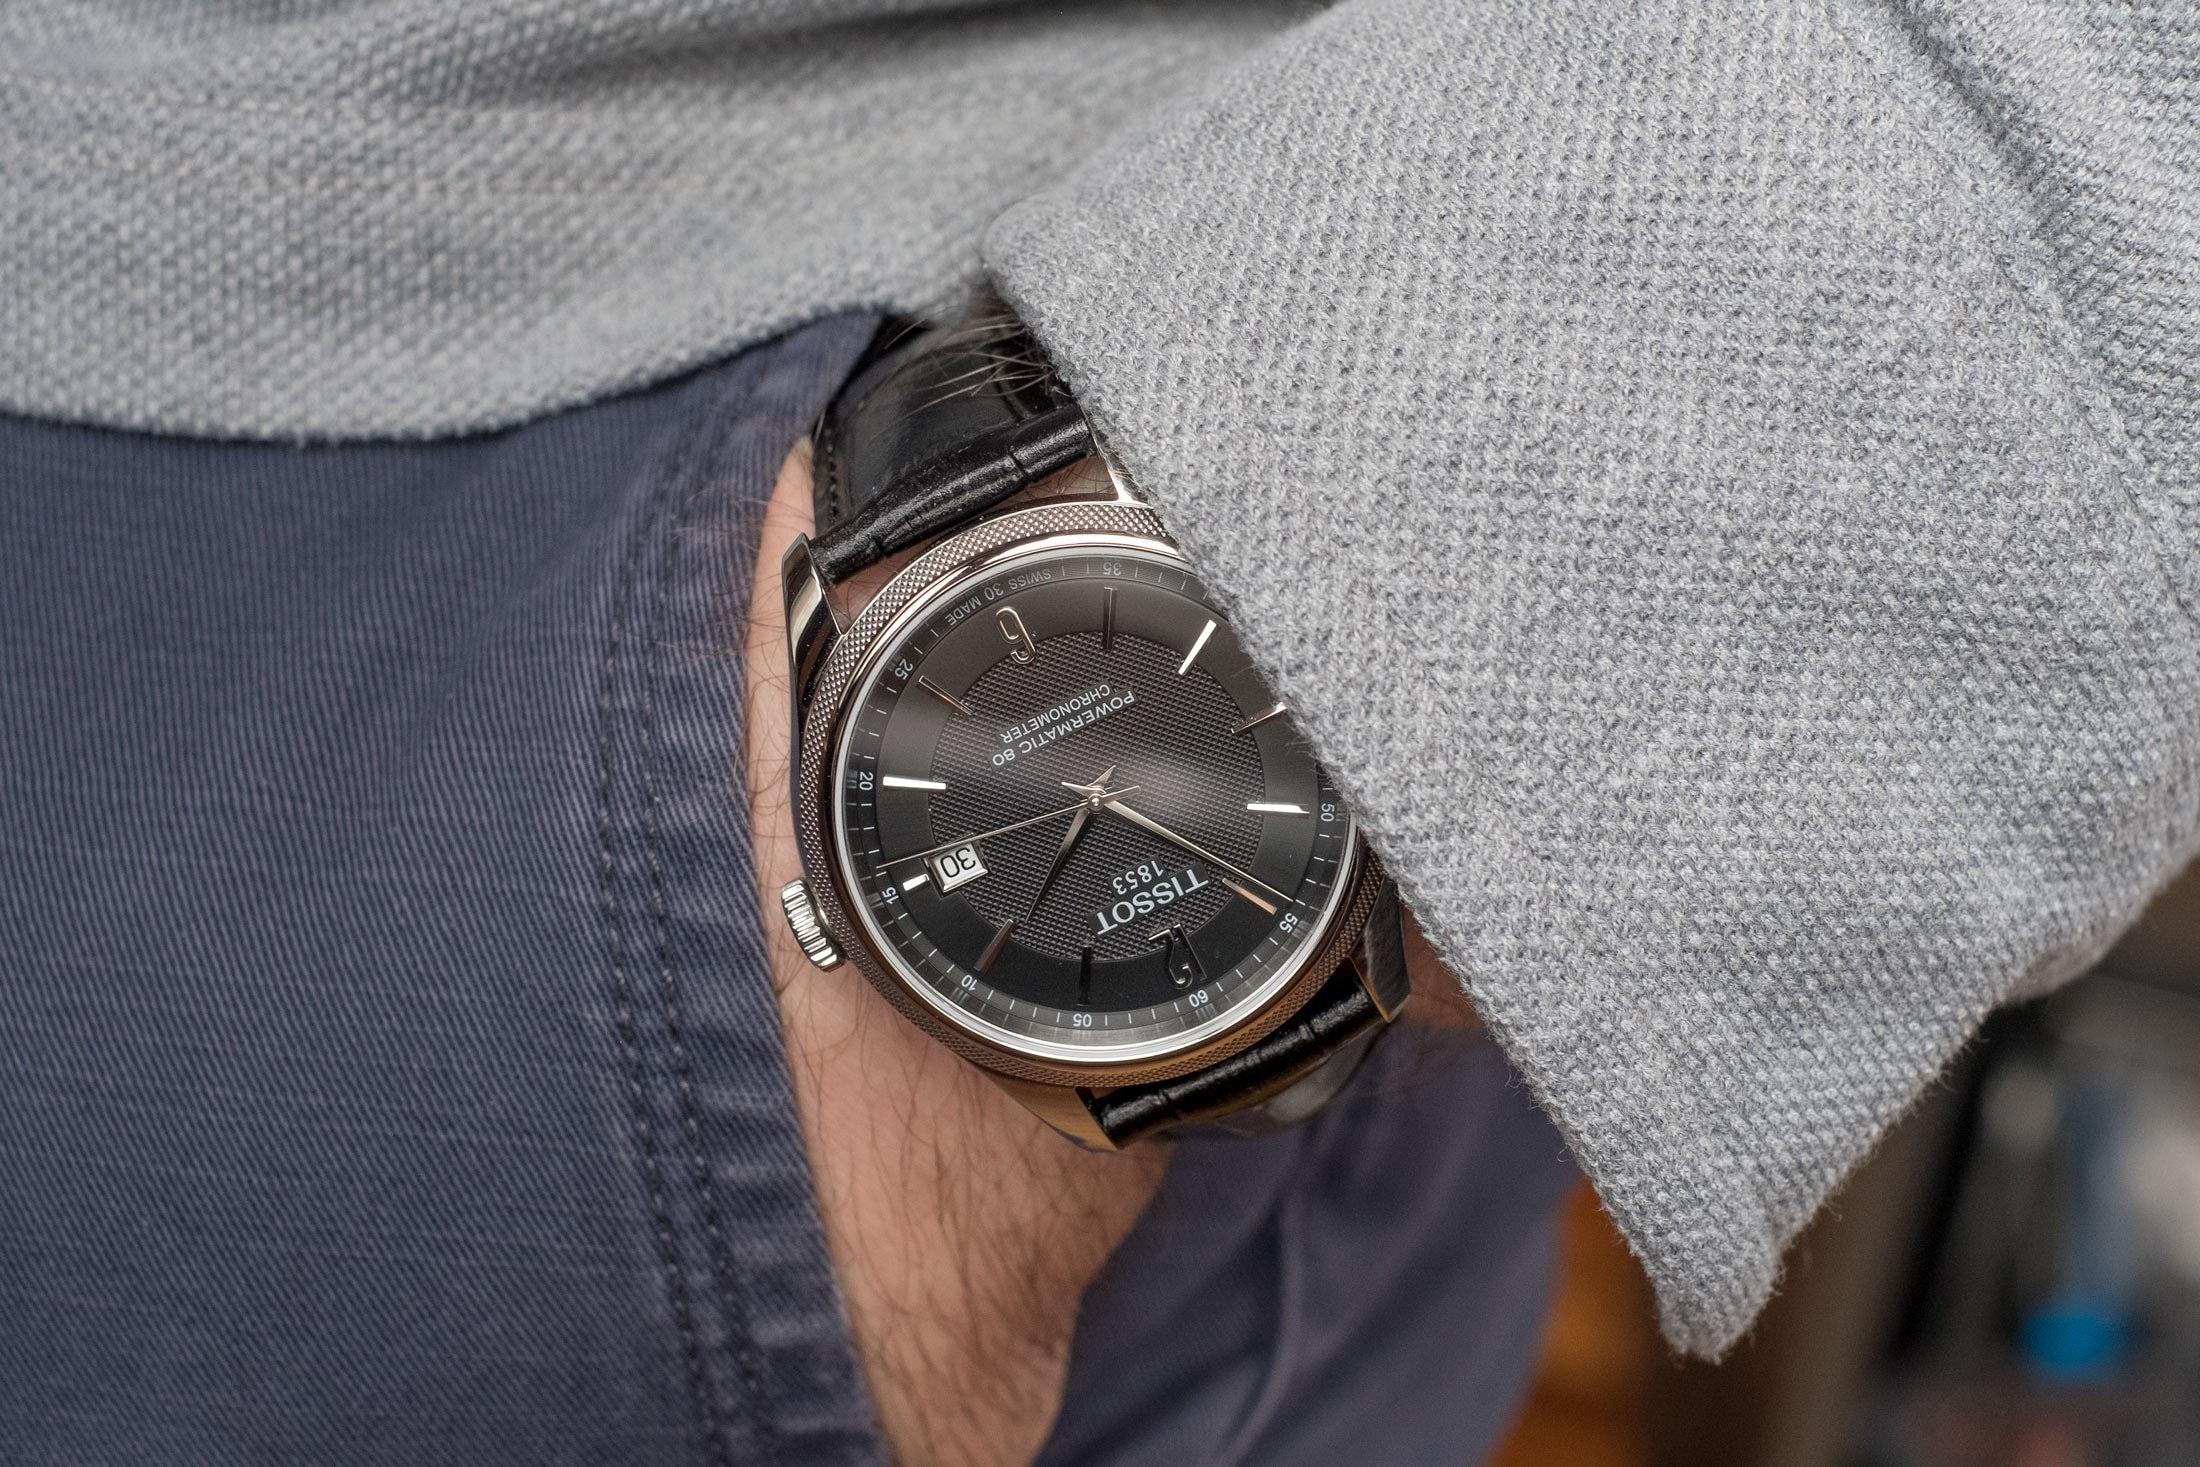 Editors' Picks: The Best New Watches Under $1,000